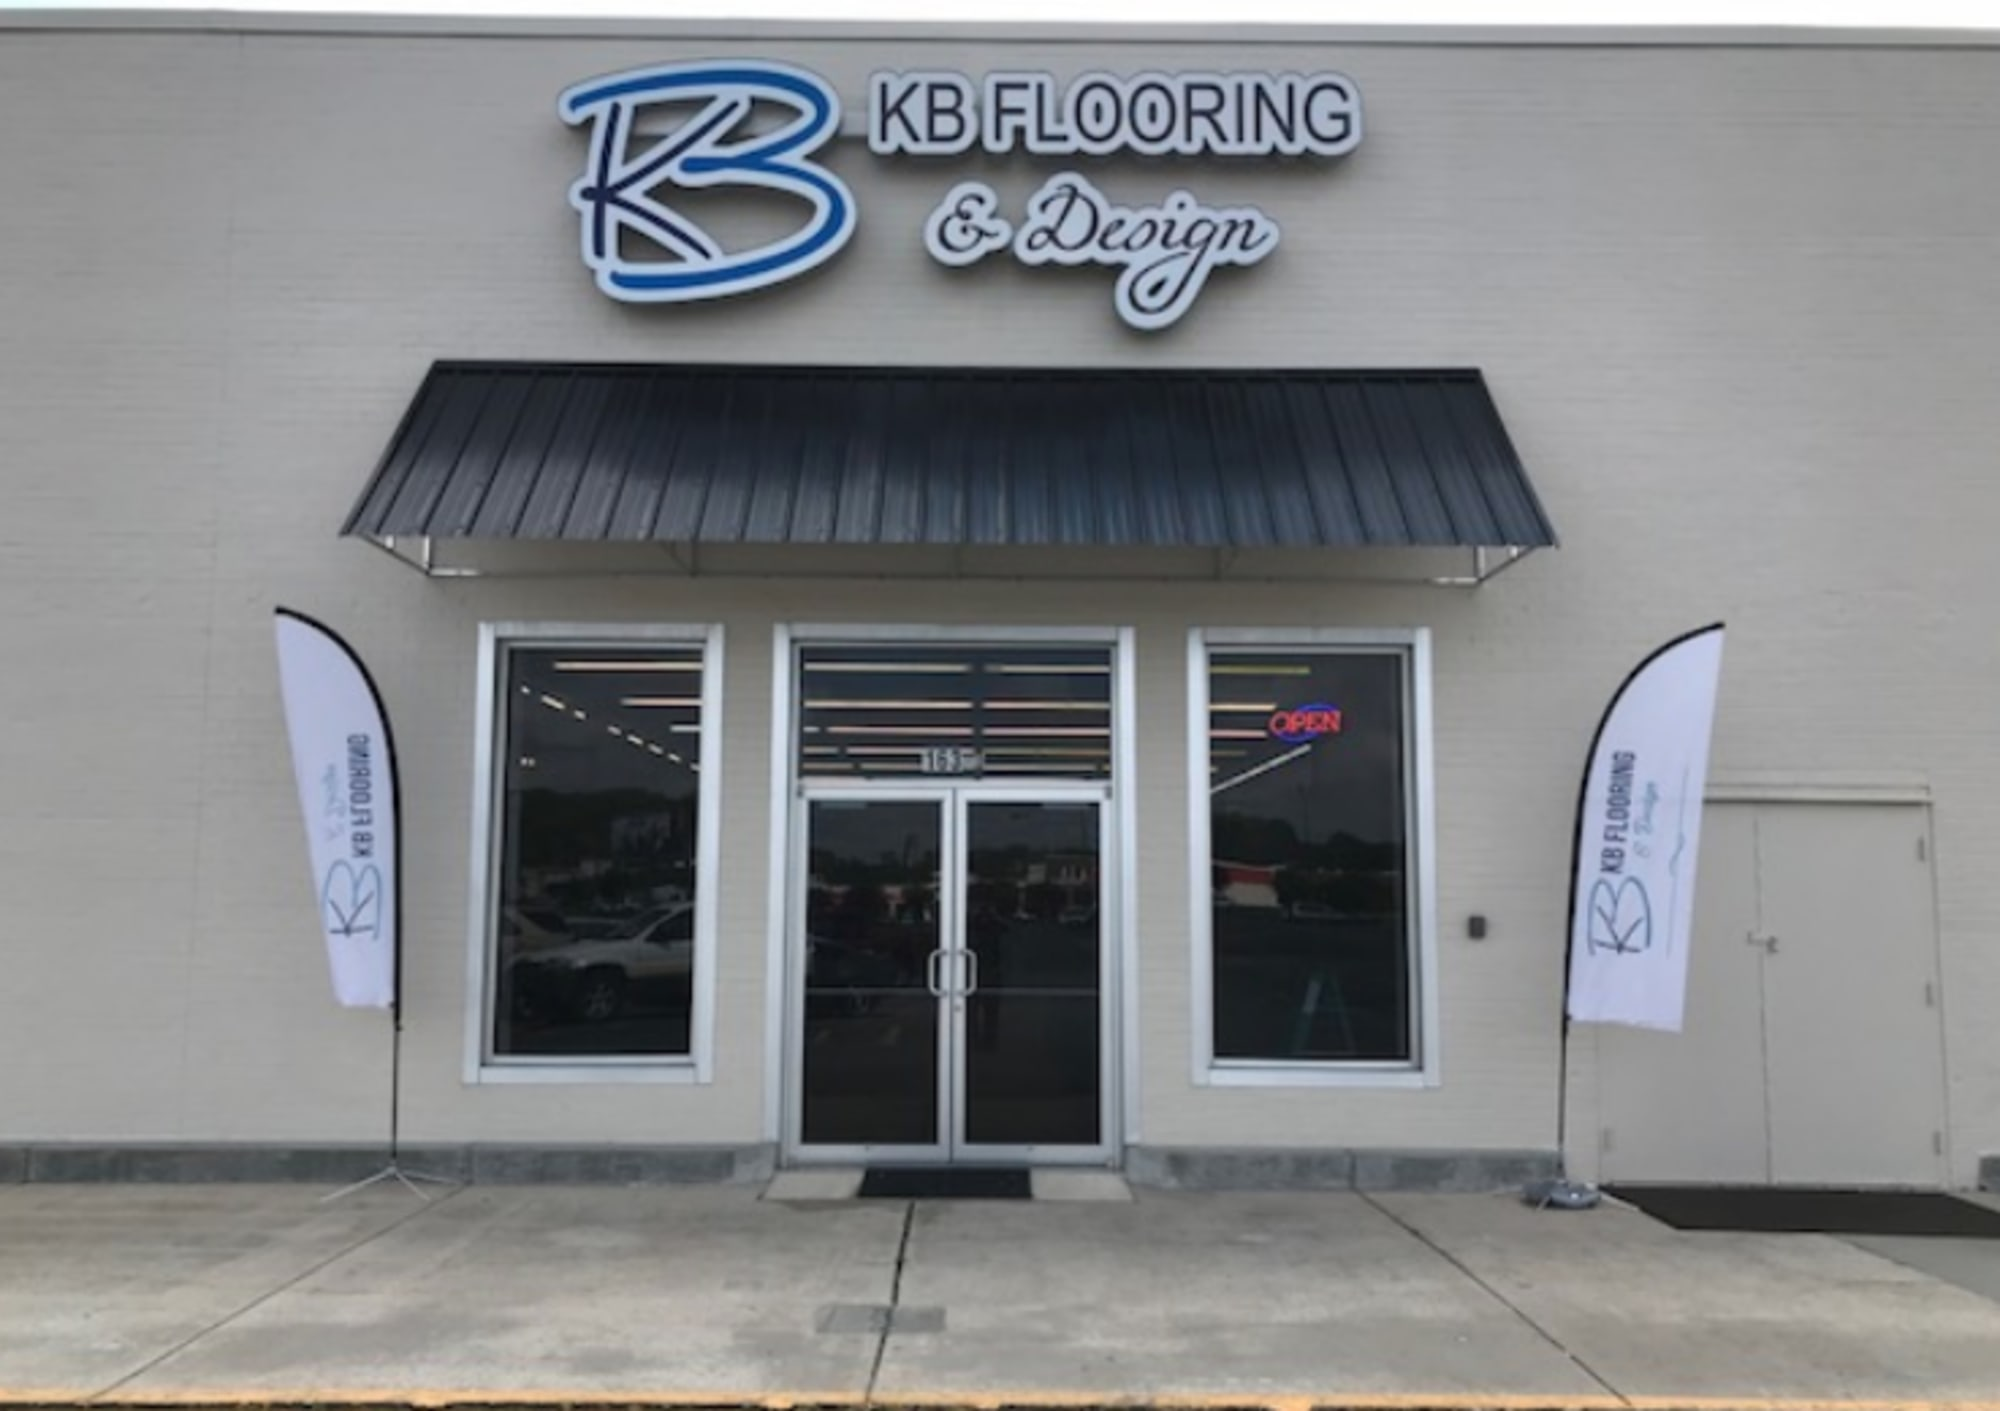 KB Flooring & Design - 163 S Virginia Ave Tifton, GA 31794